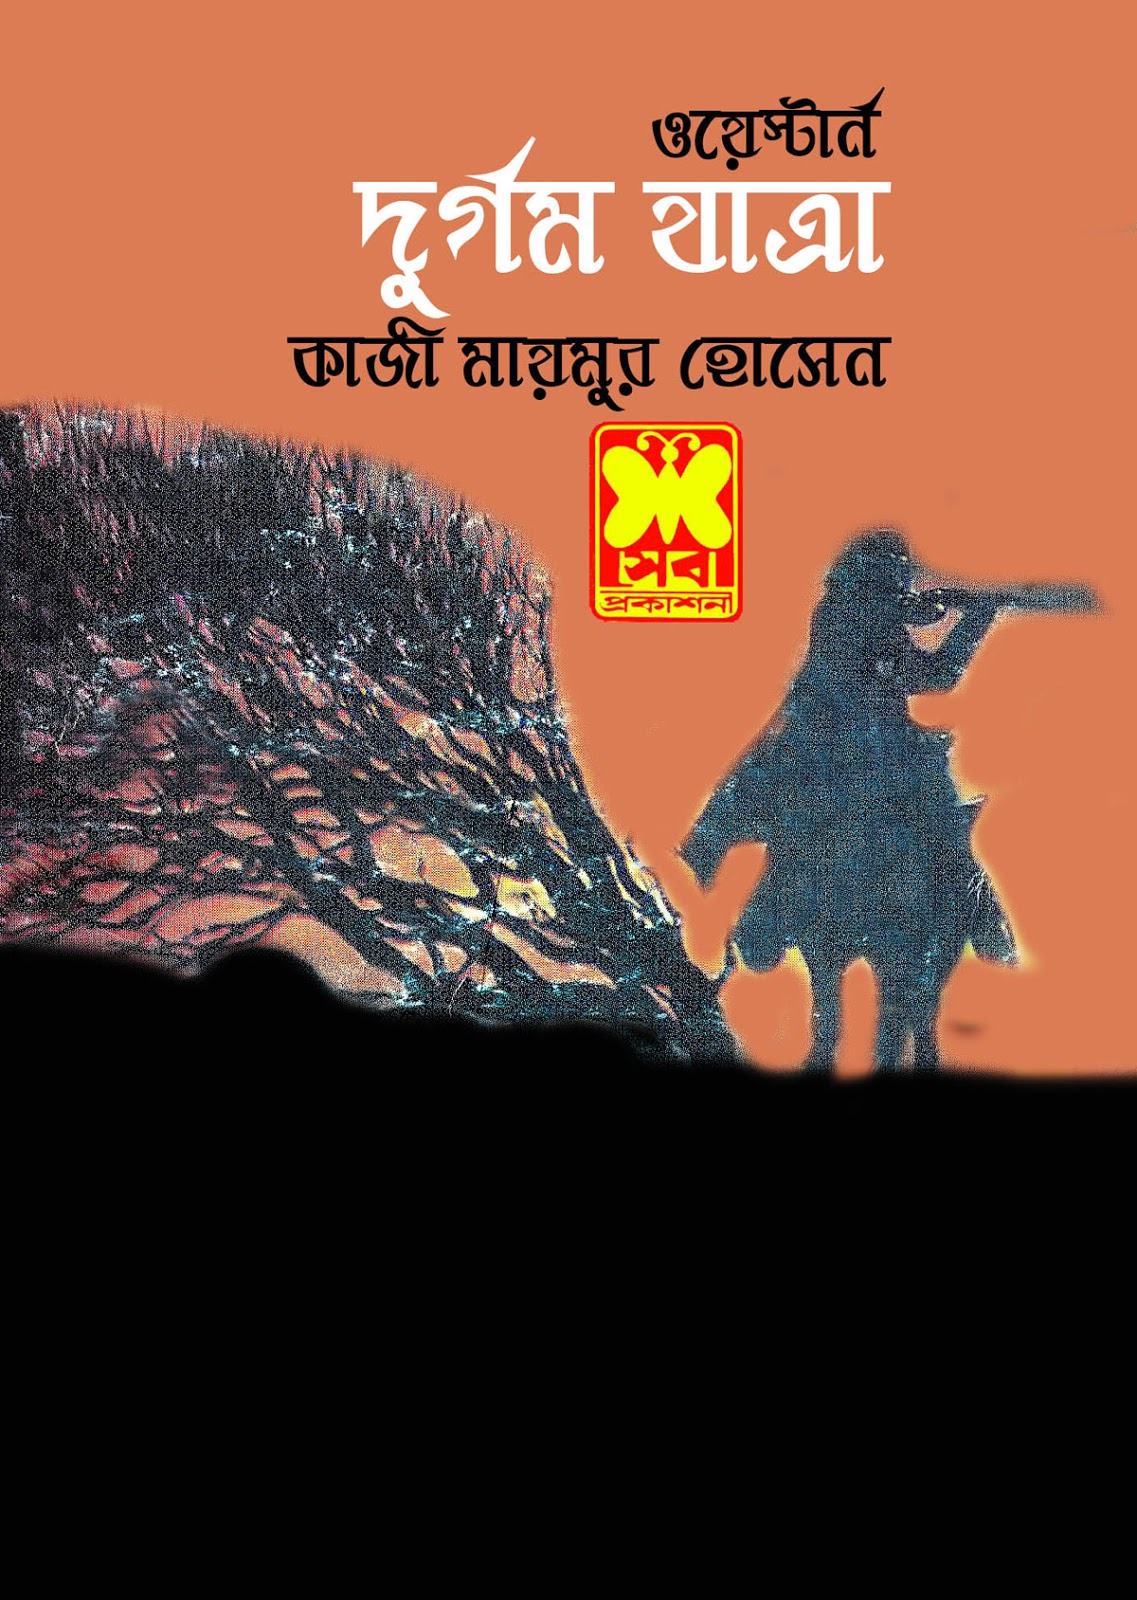 Durgom Jatra by Kazi Maimur Hossain (Western Series) ~ Free Download